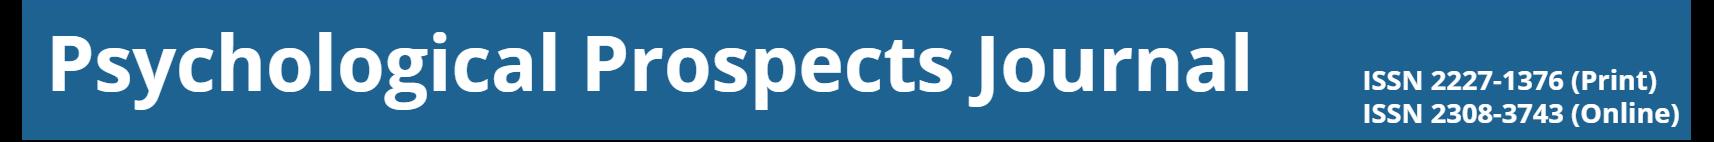 Psychological Prospects Journal